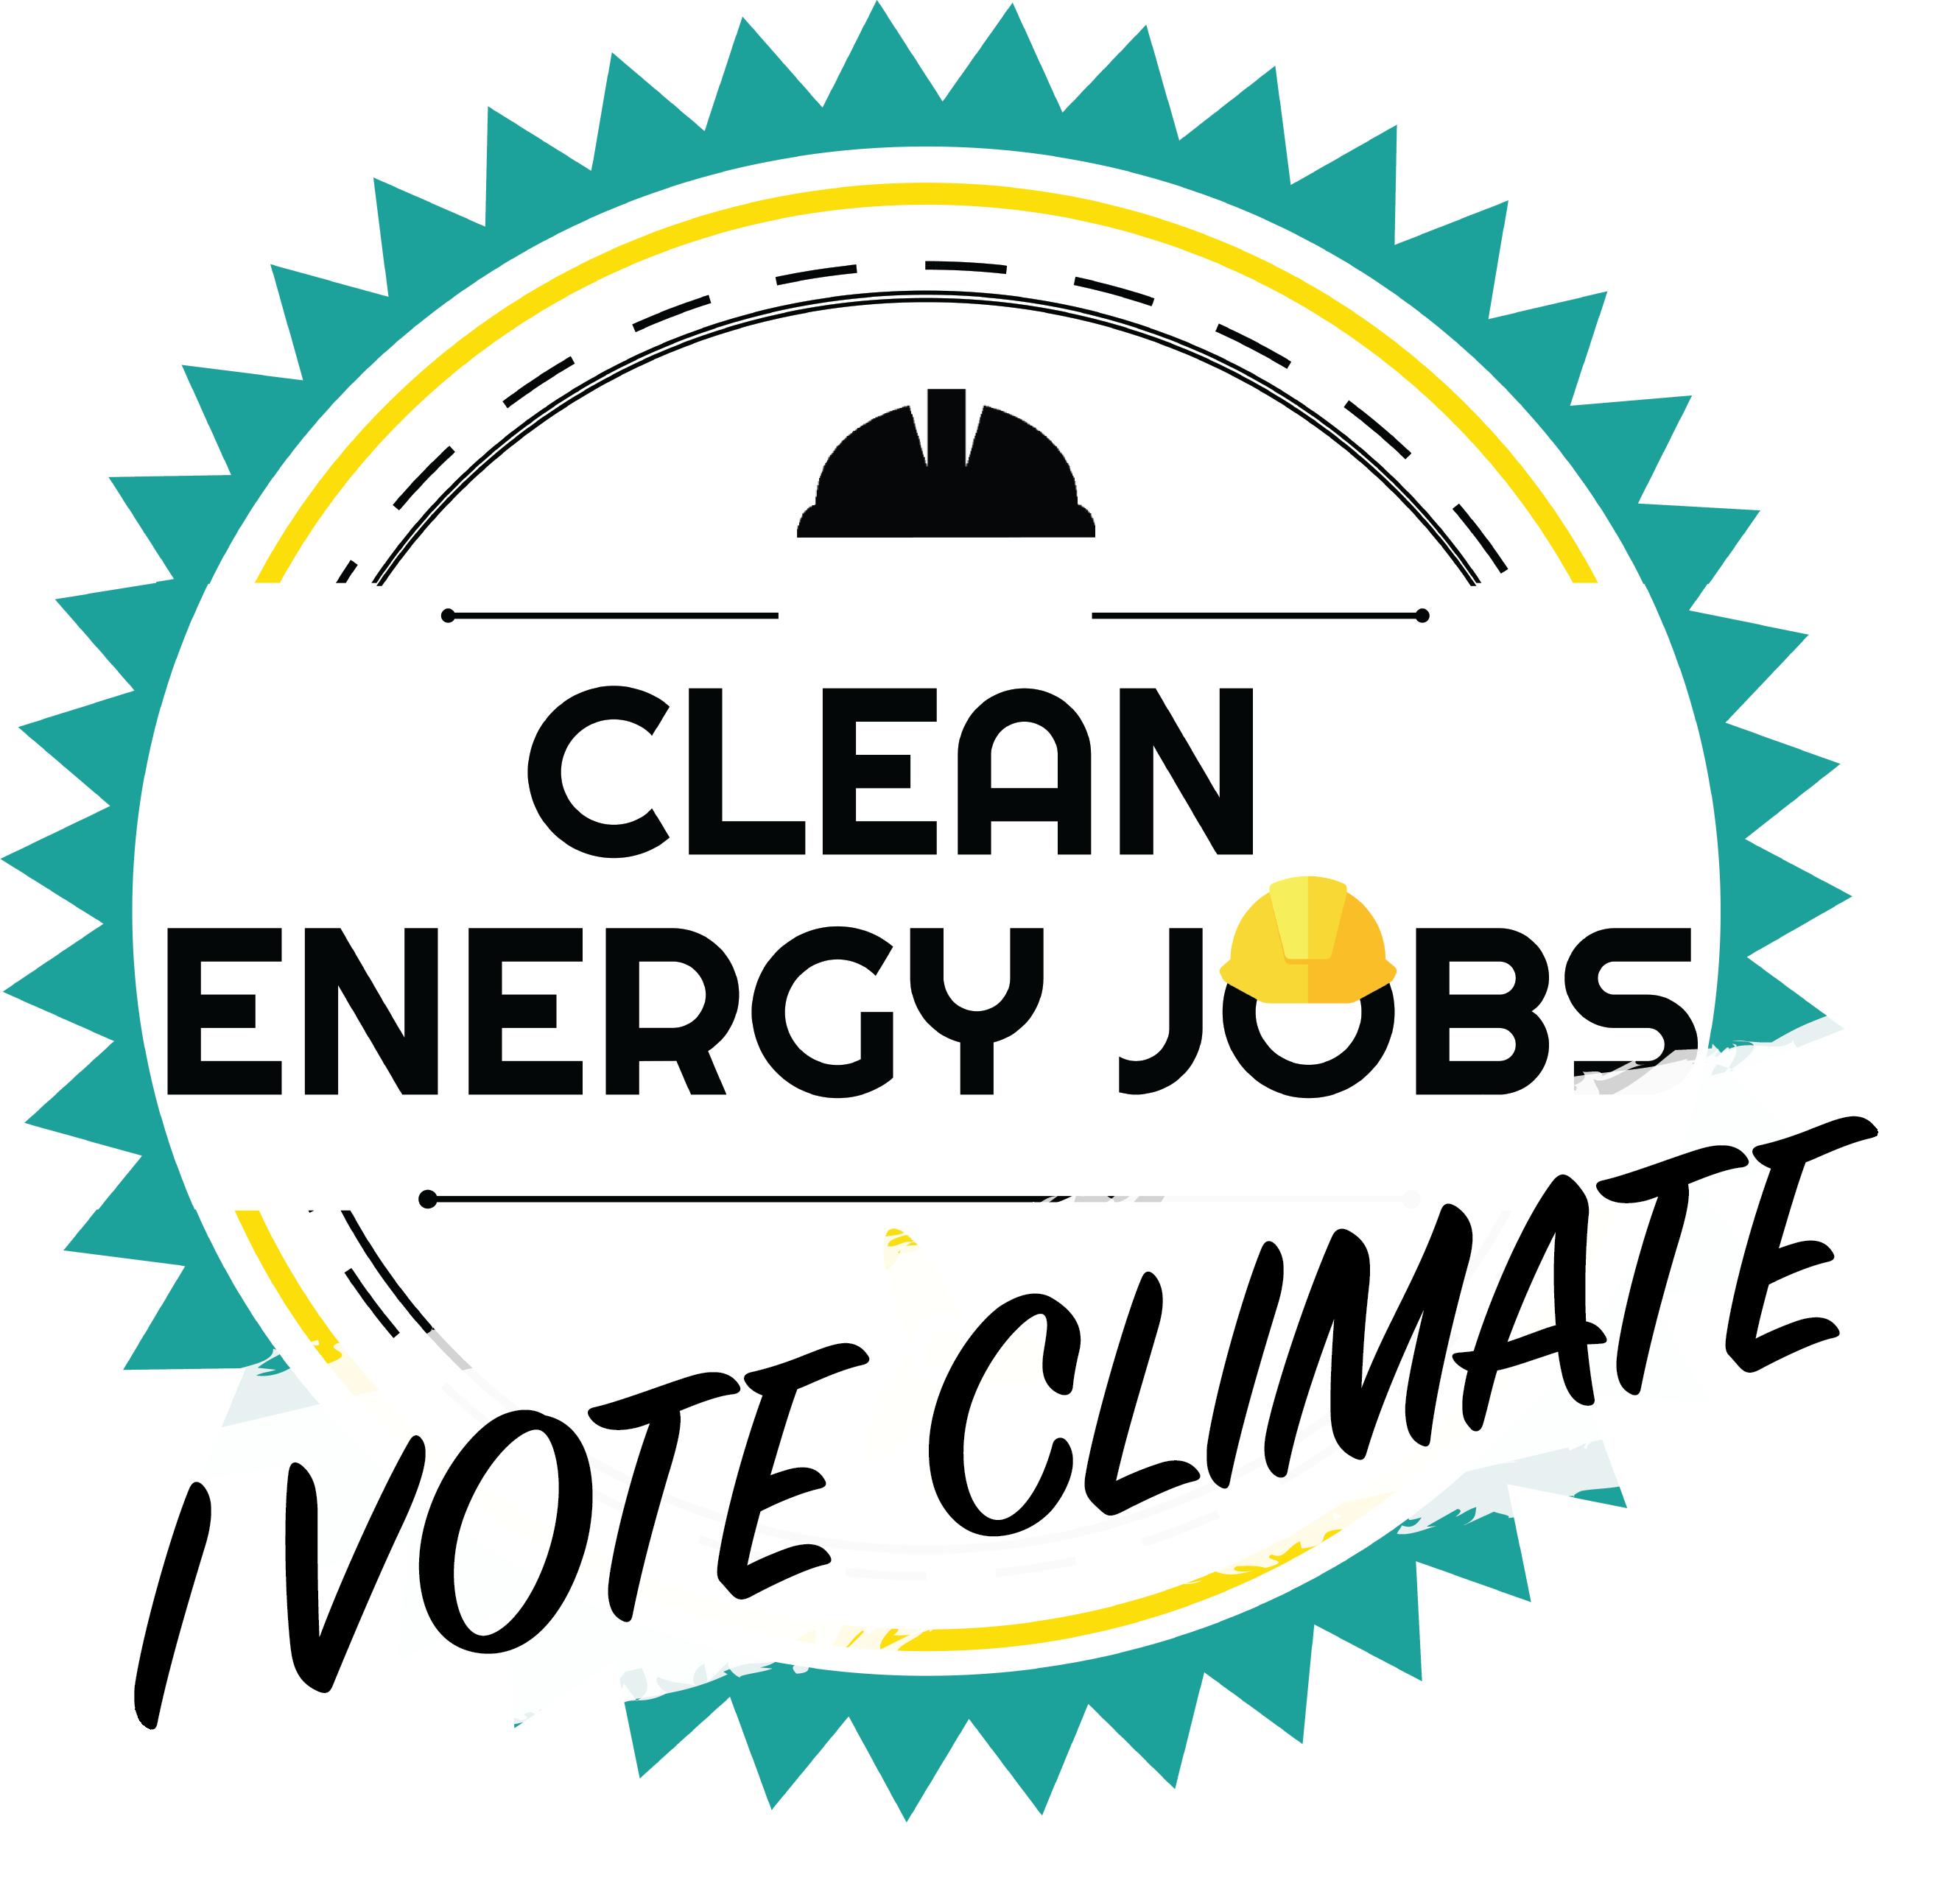 logo_CEJ_i_vote_climate_(1).png